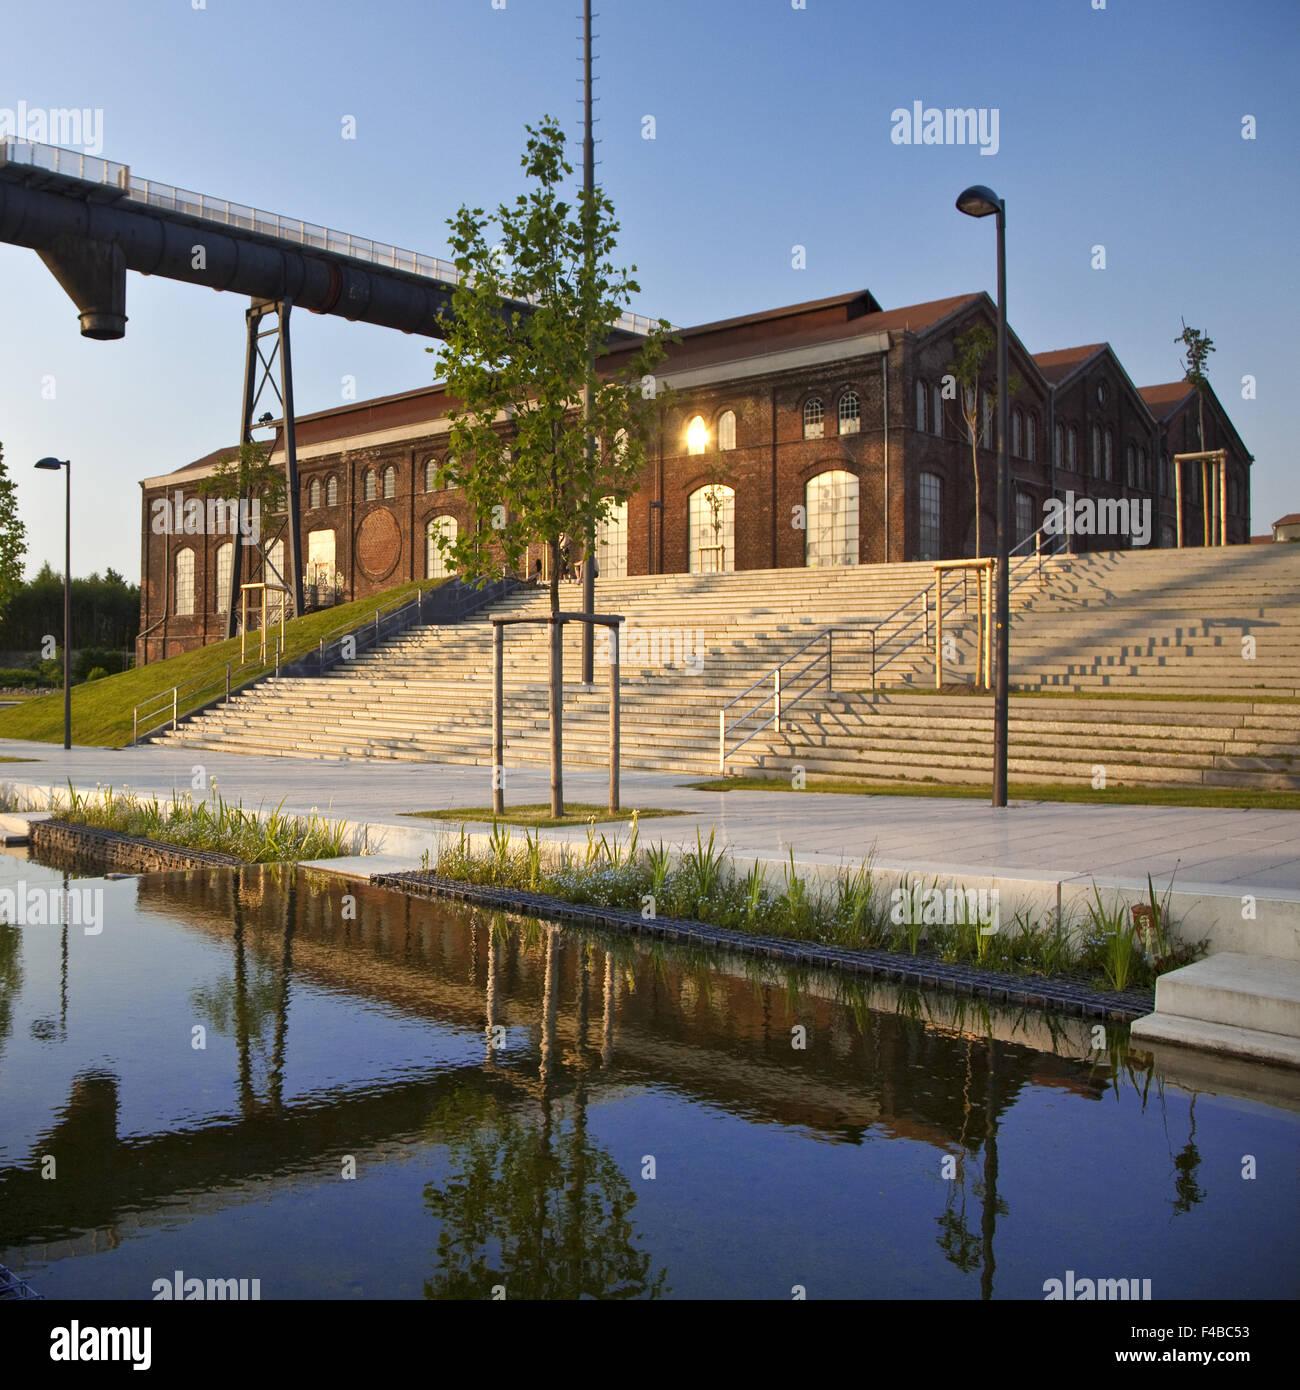 Phoenix Halle, Dortmund, Germany. - Stock Image